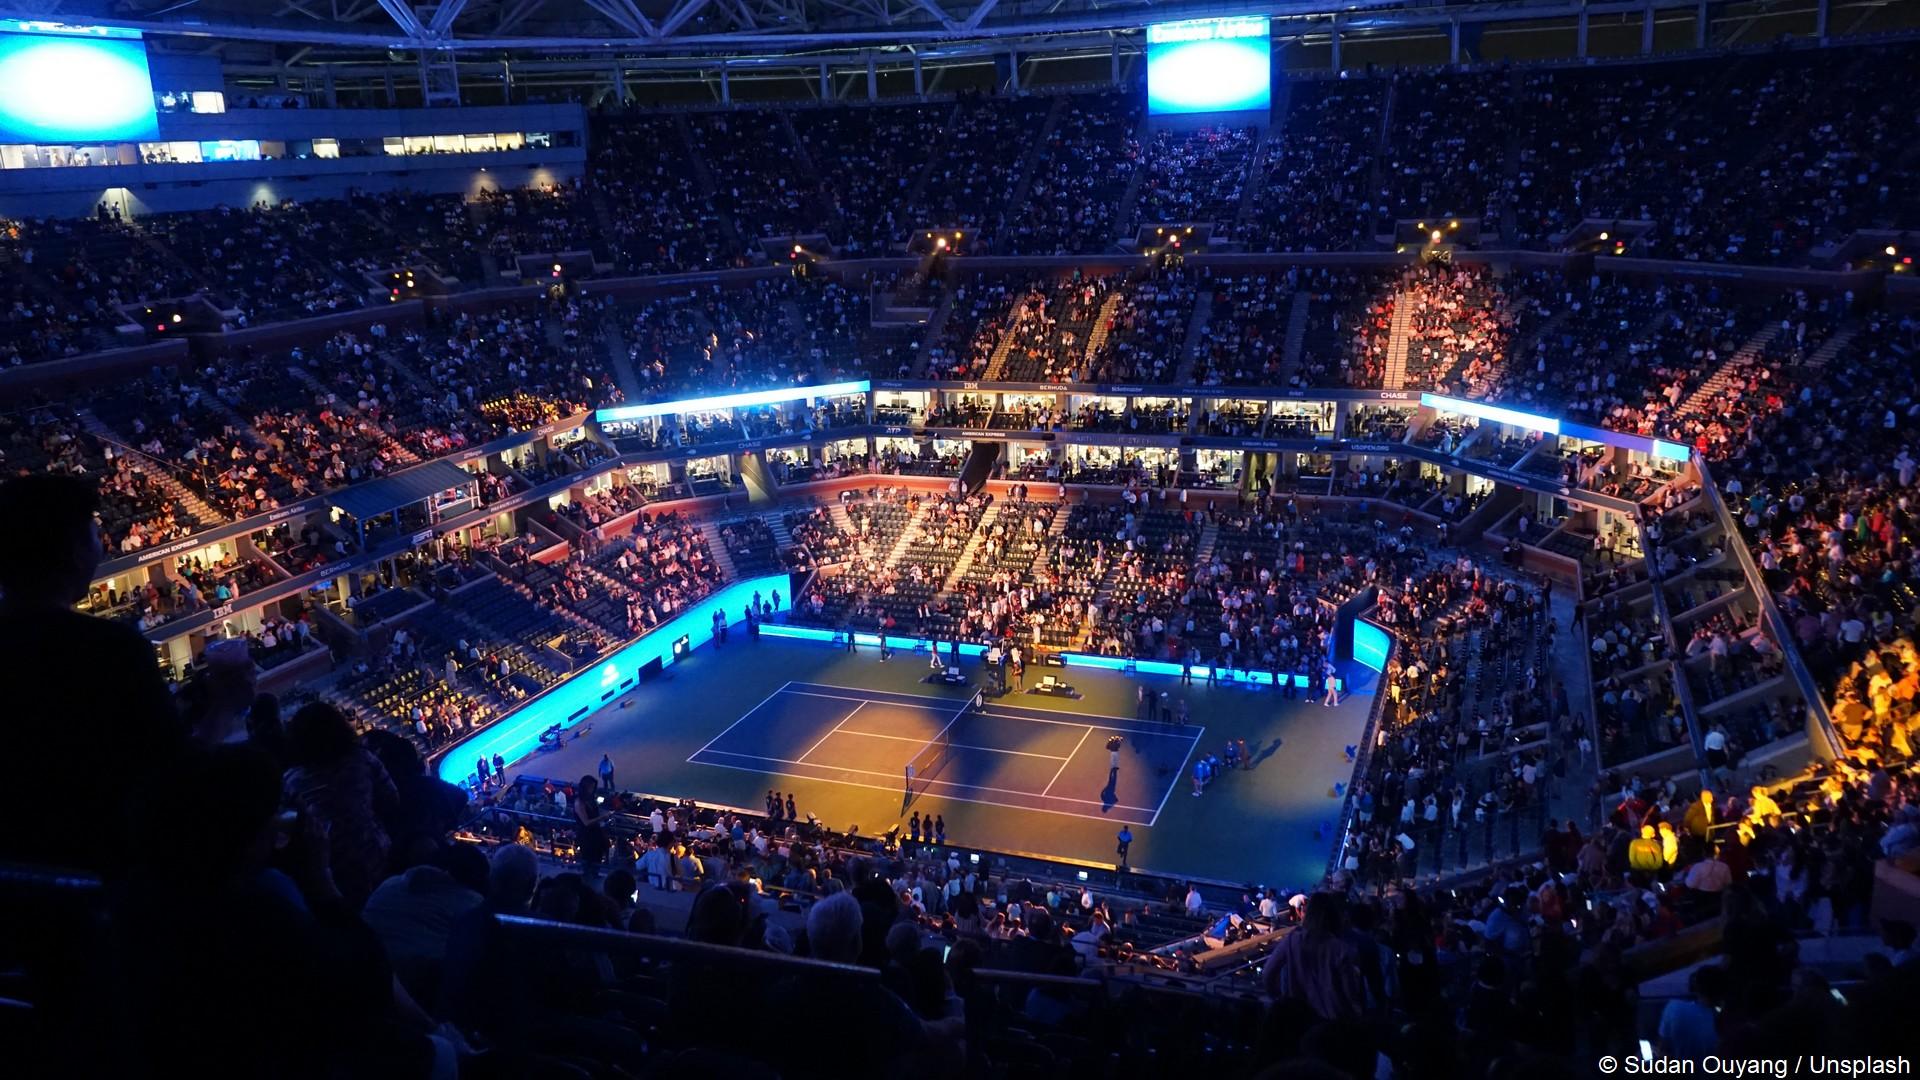 Tennis – US Open (1) (c) Sudan Ouyang Unsplash